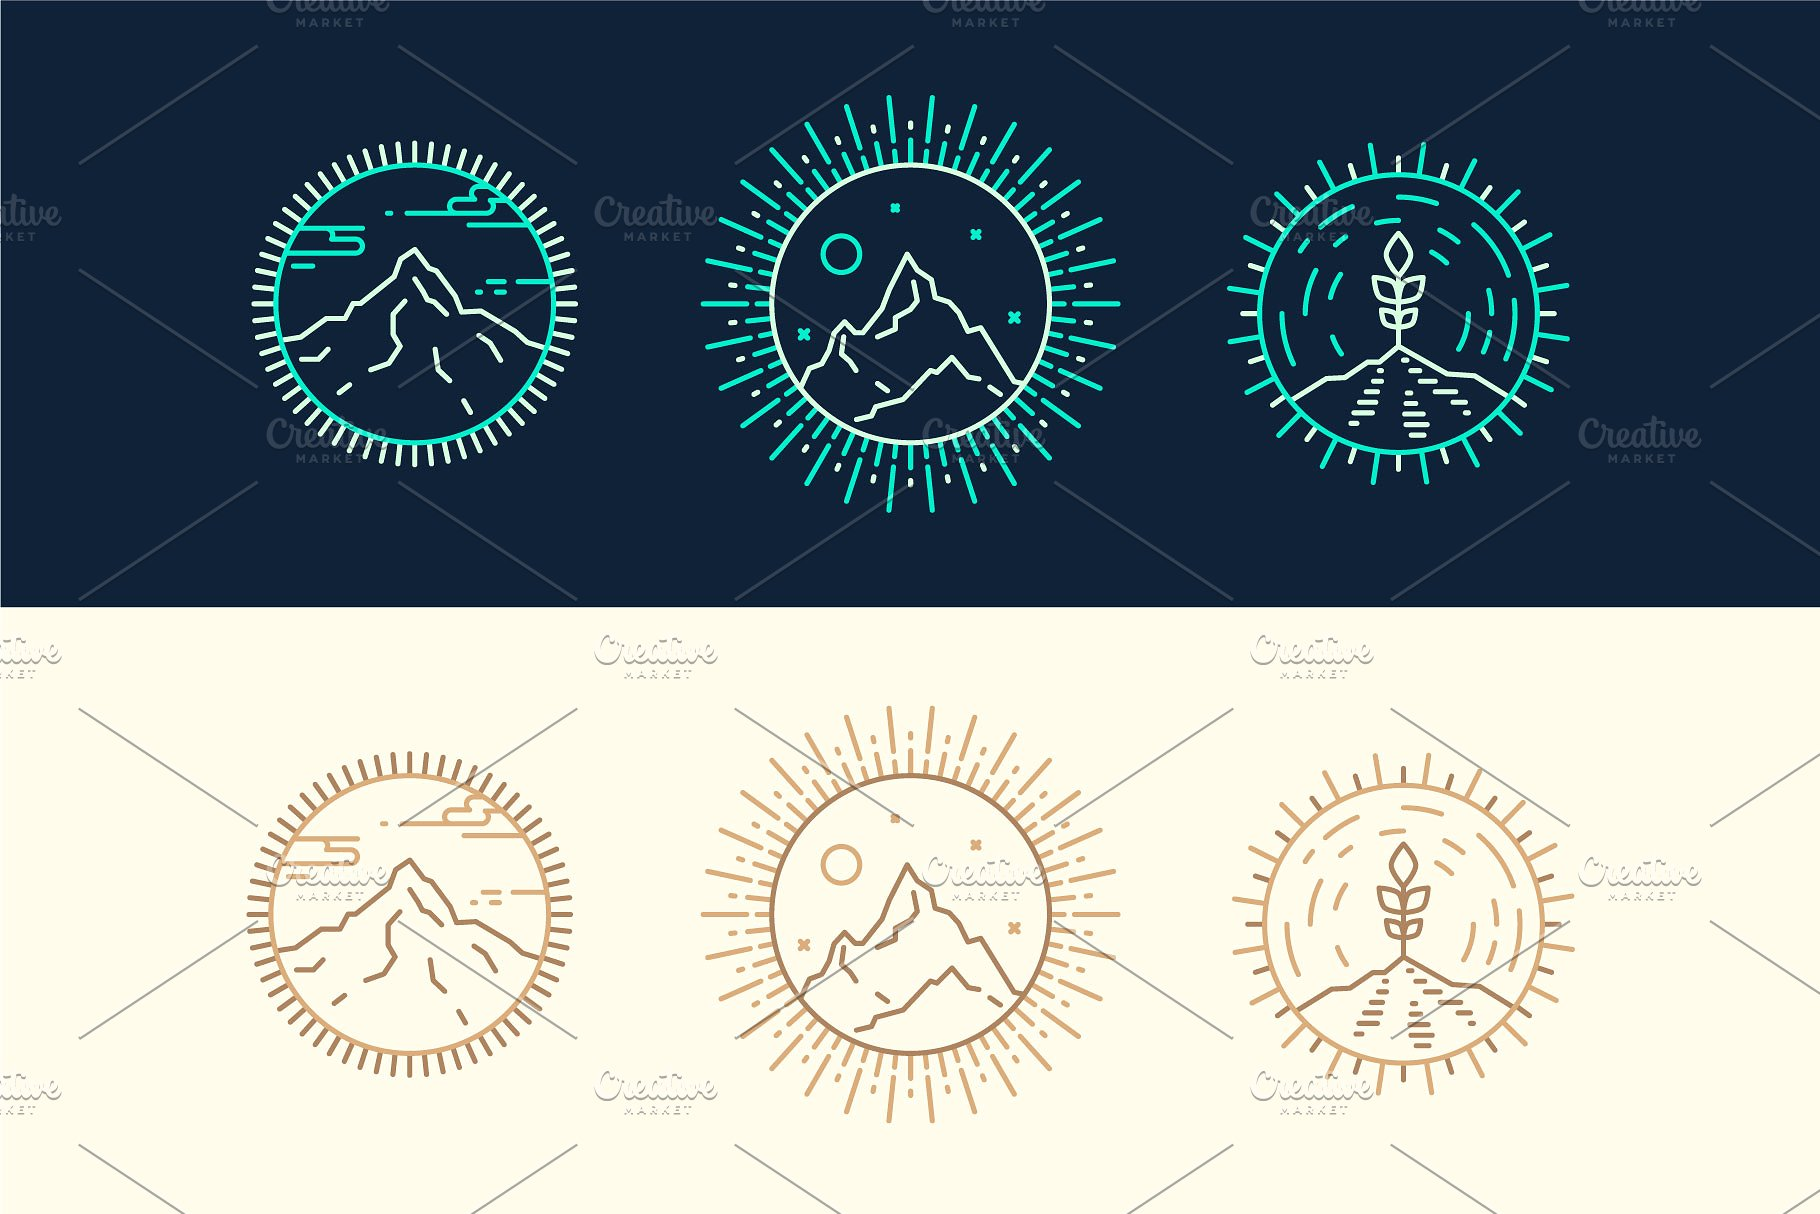 cover-mountain-logotypes-004-.jpg